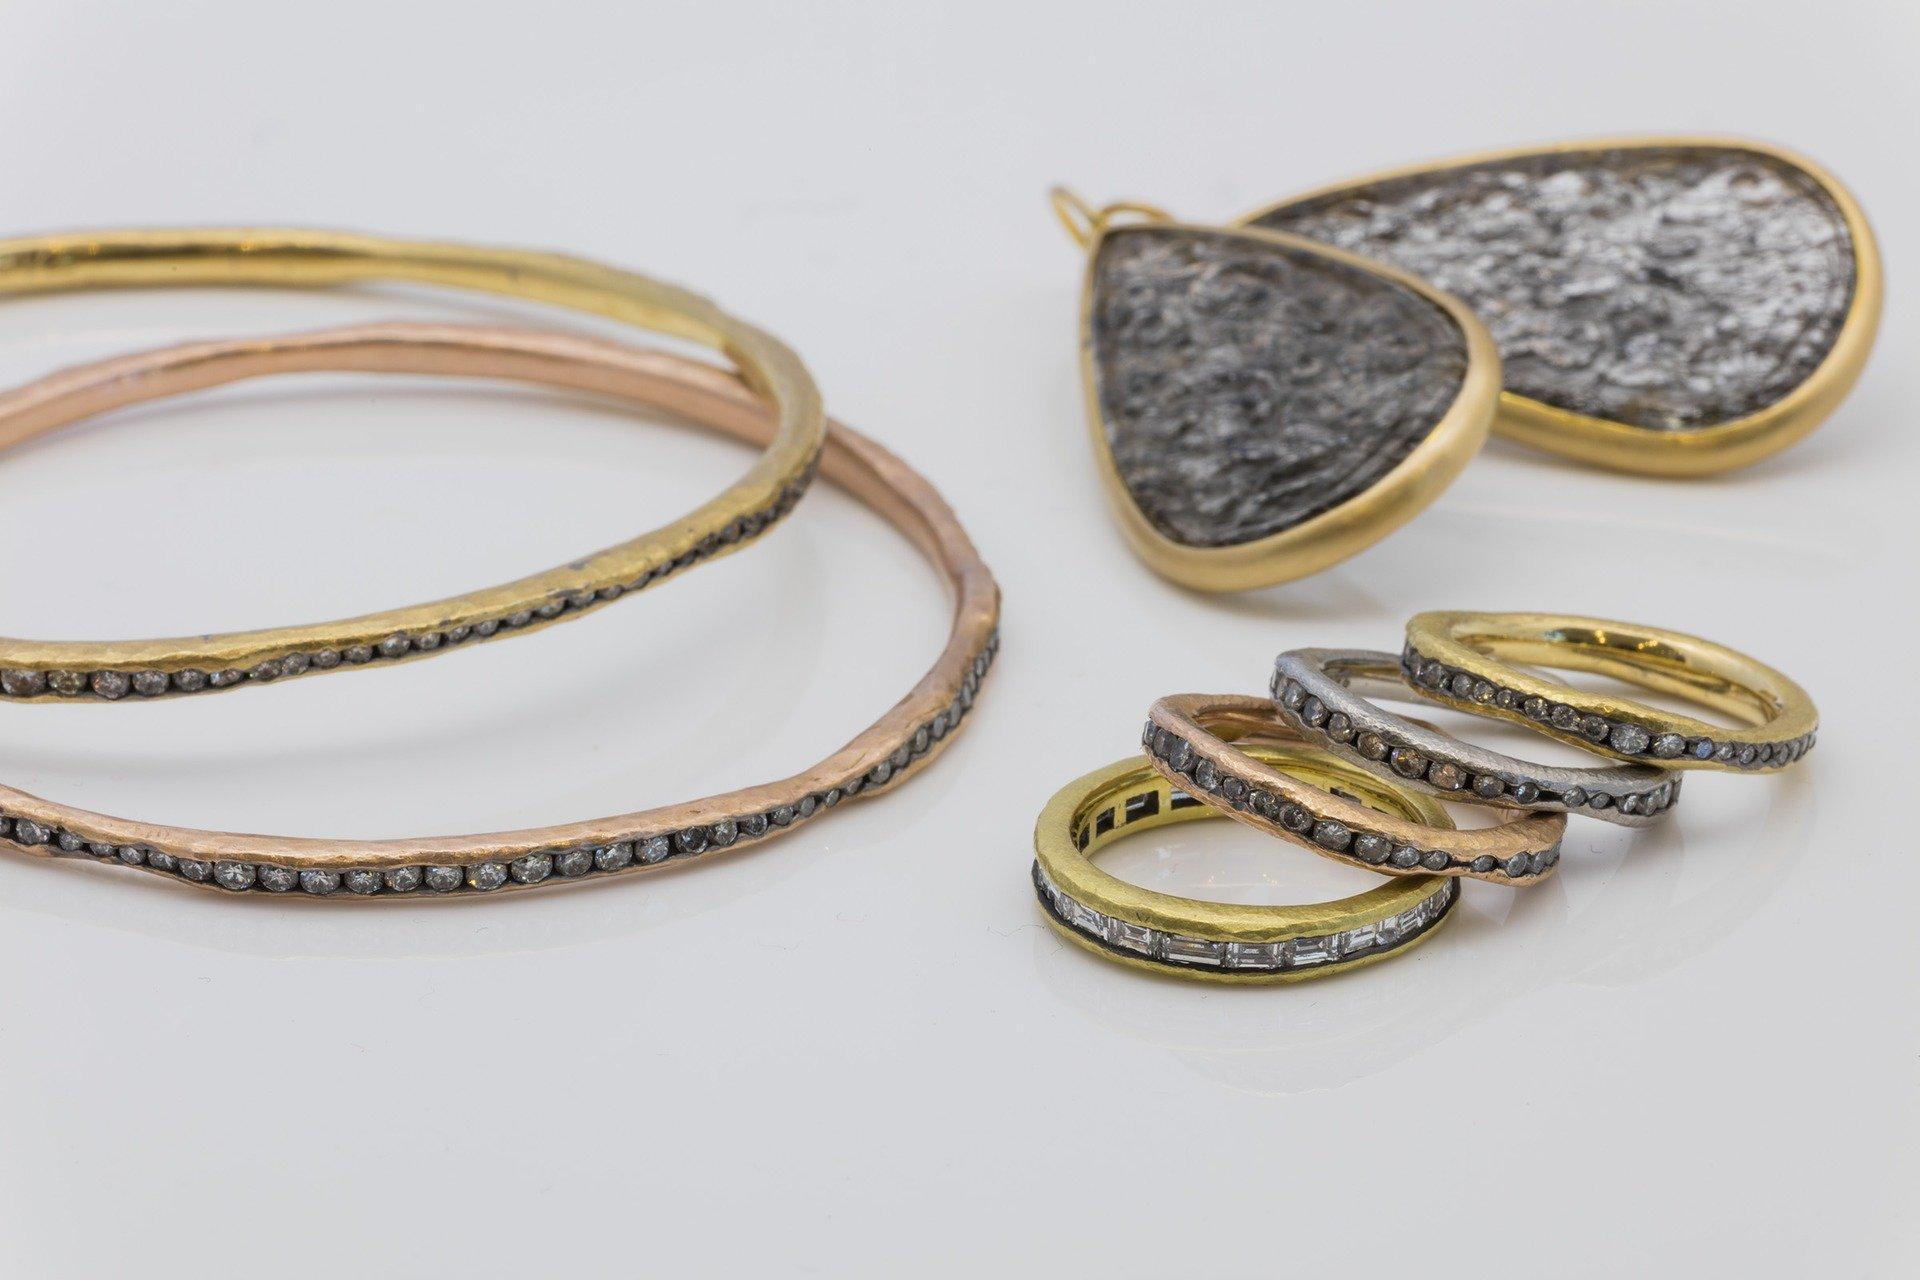 Handcrafted Jewelery